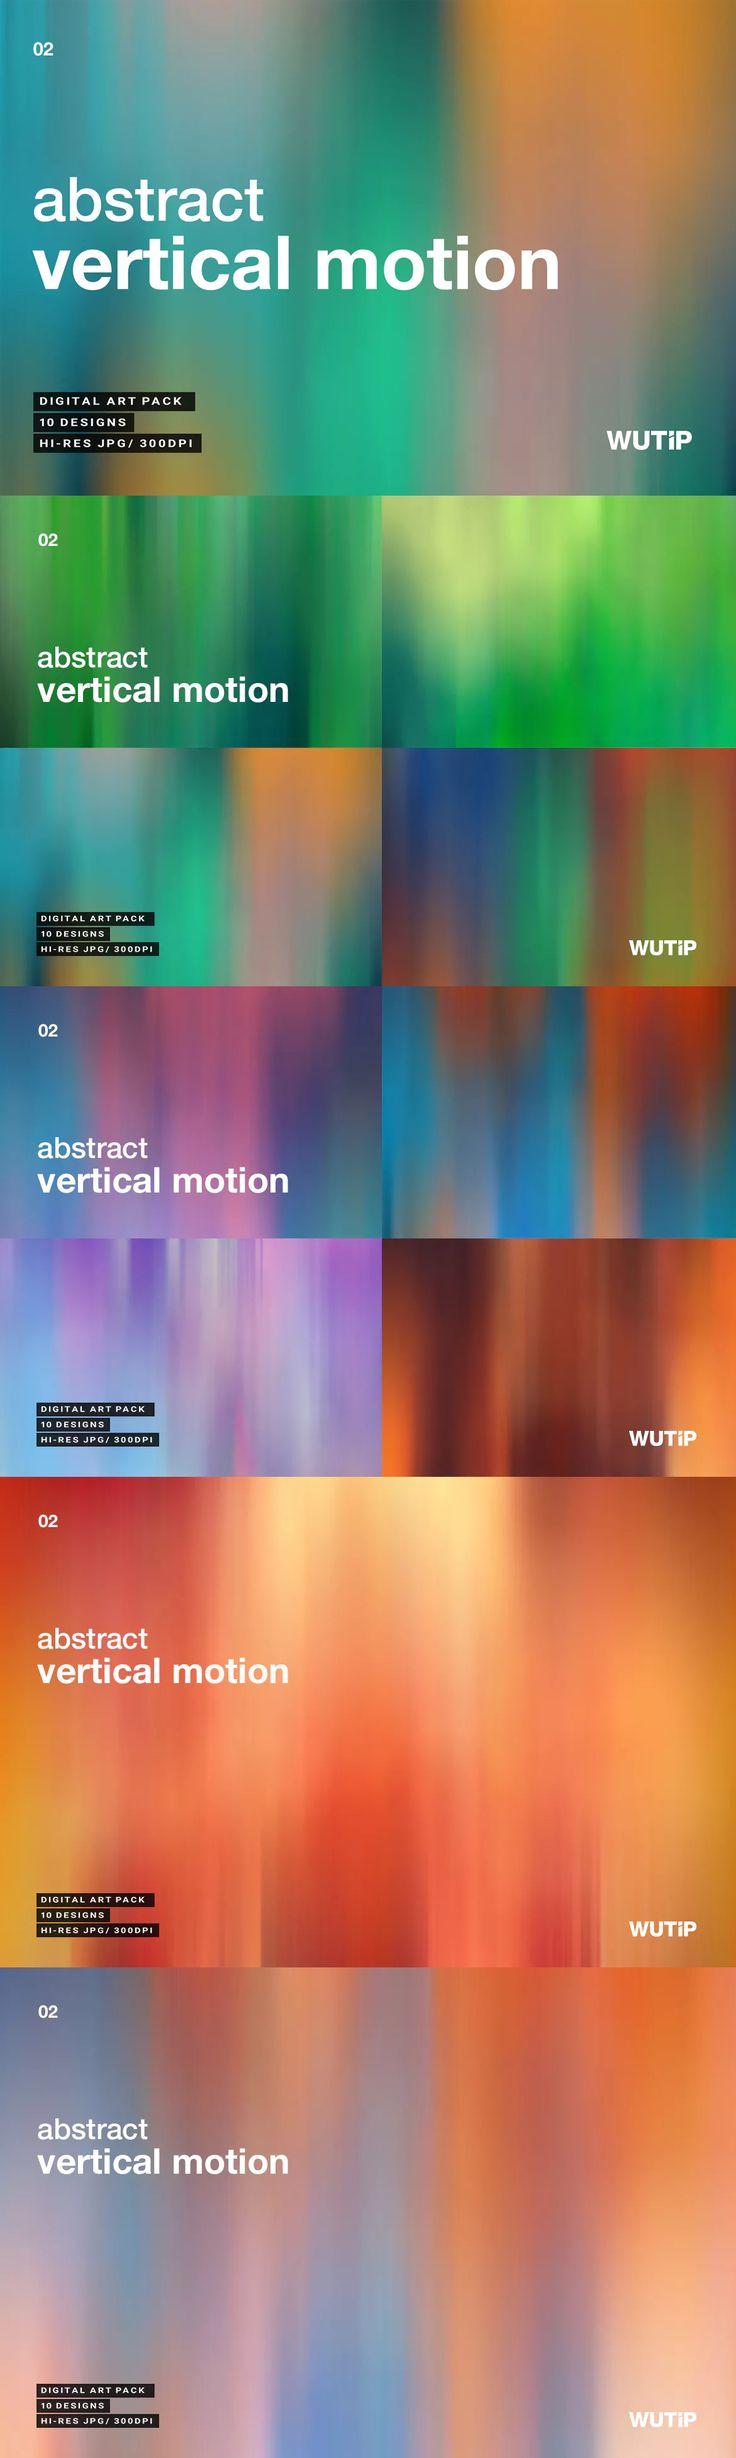 Abstract Vertical Motion Backgrounds  #unlimiteddownloads